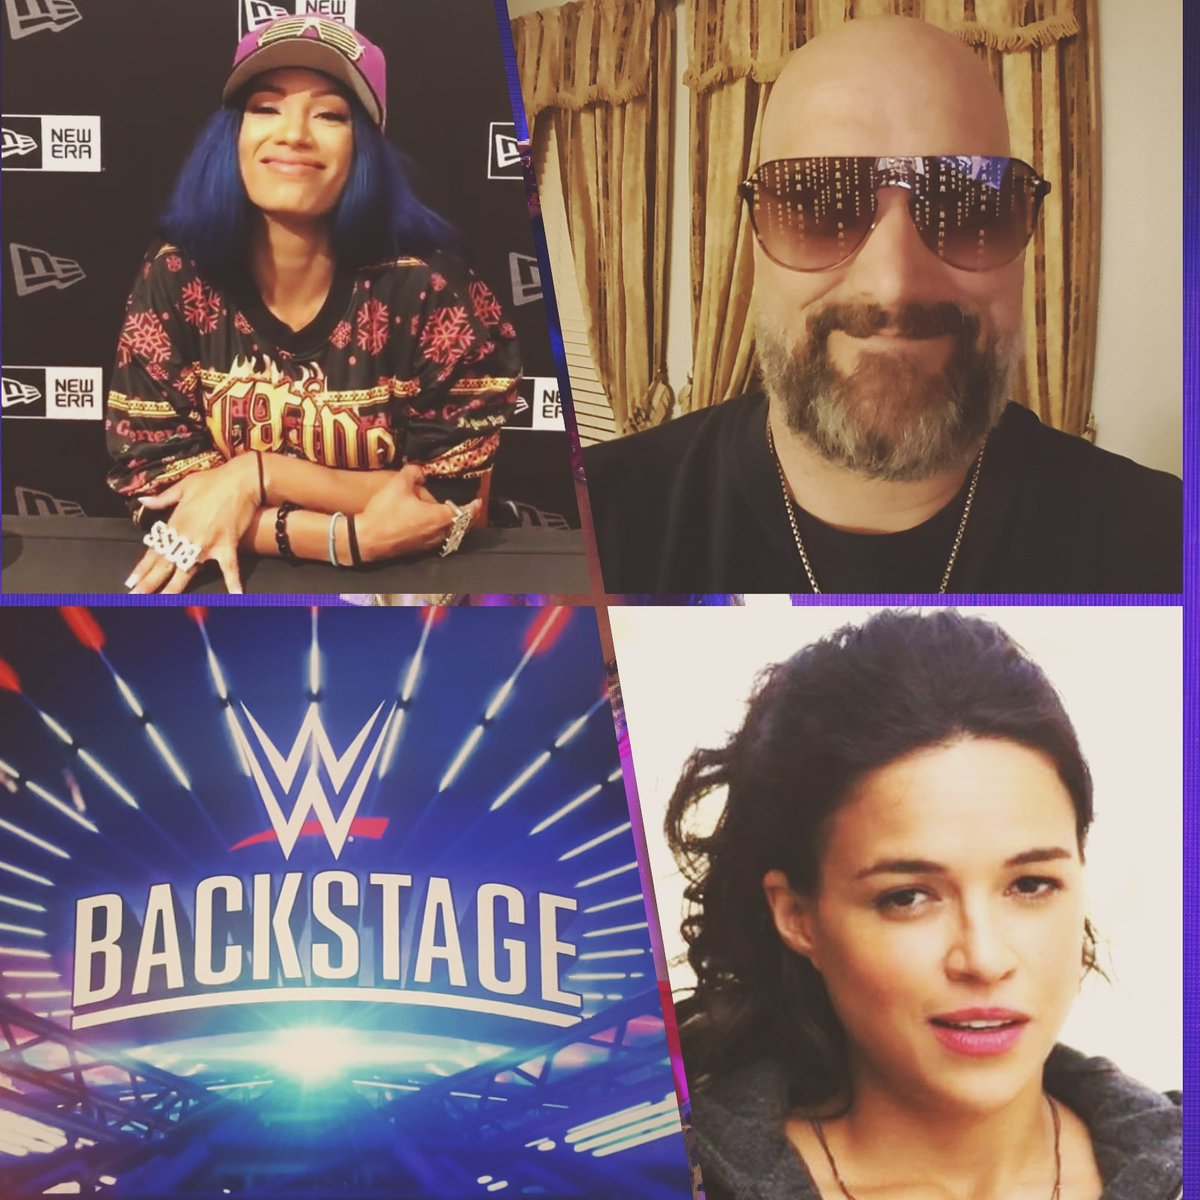 Next Watching #WWEBackstage #LetsGo Y'all #Happy #Selfie #WrestlerLover #SashaKrew #LegitBlueprint #mrodfamily #mrodlover 😊😍💙💜